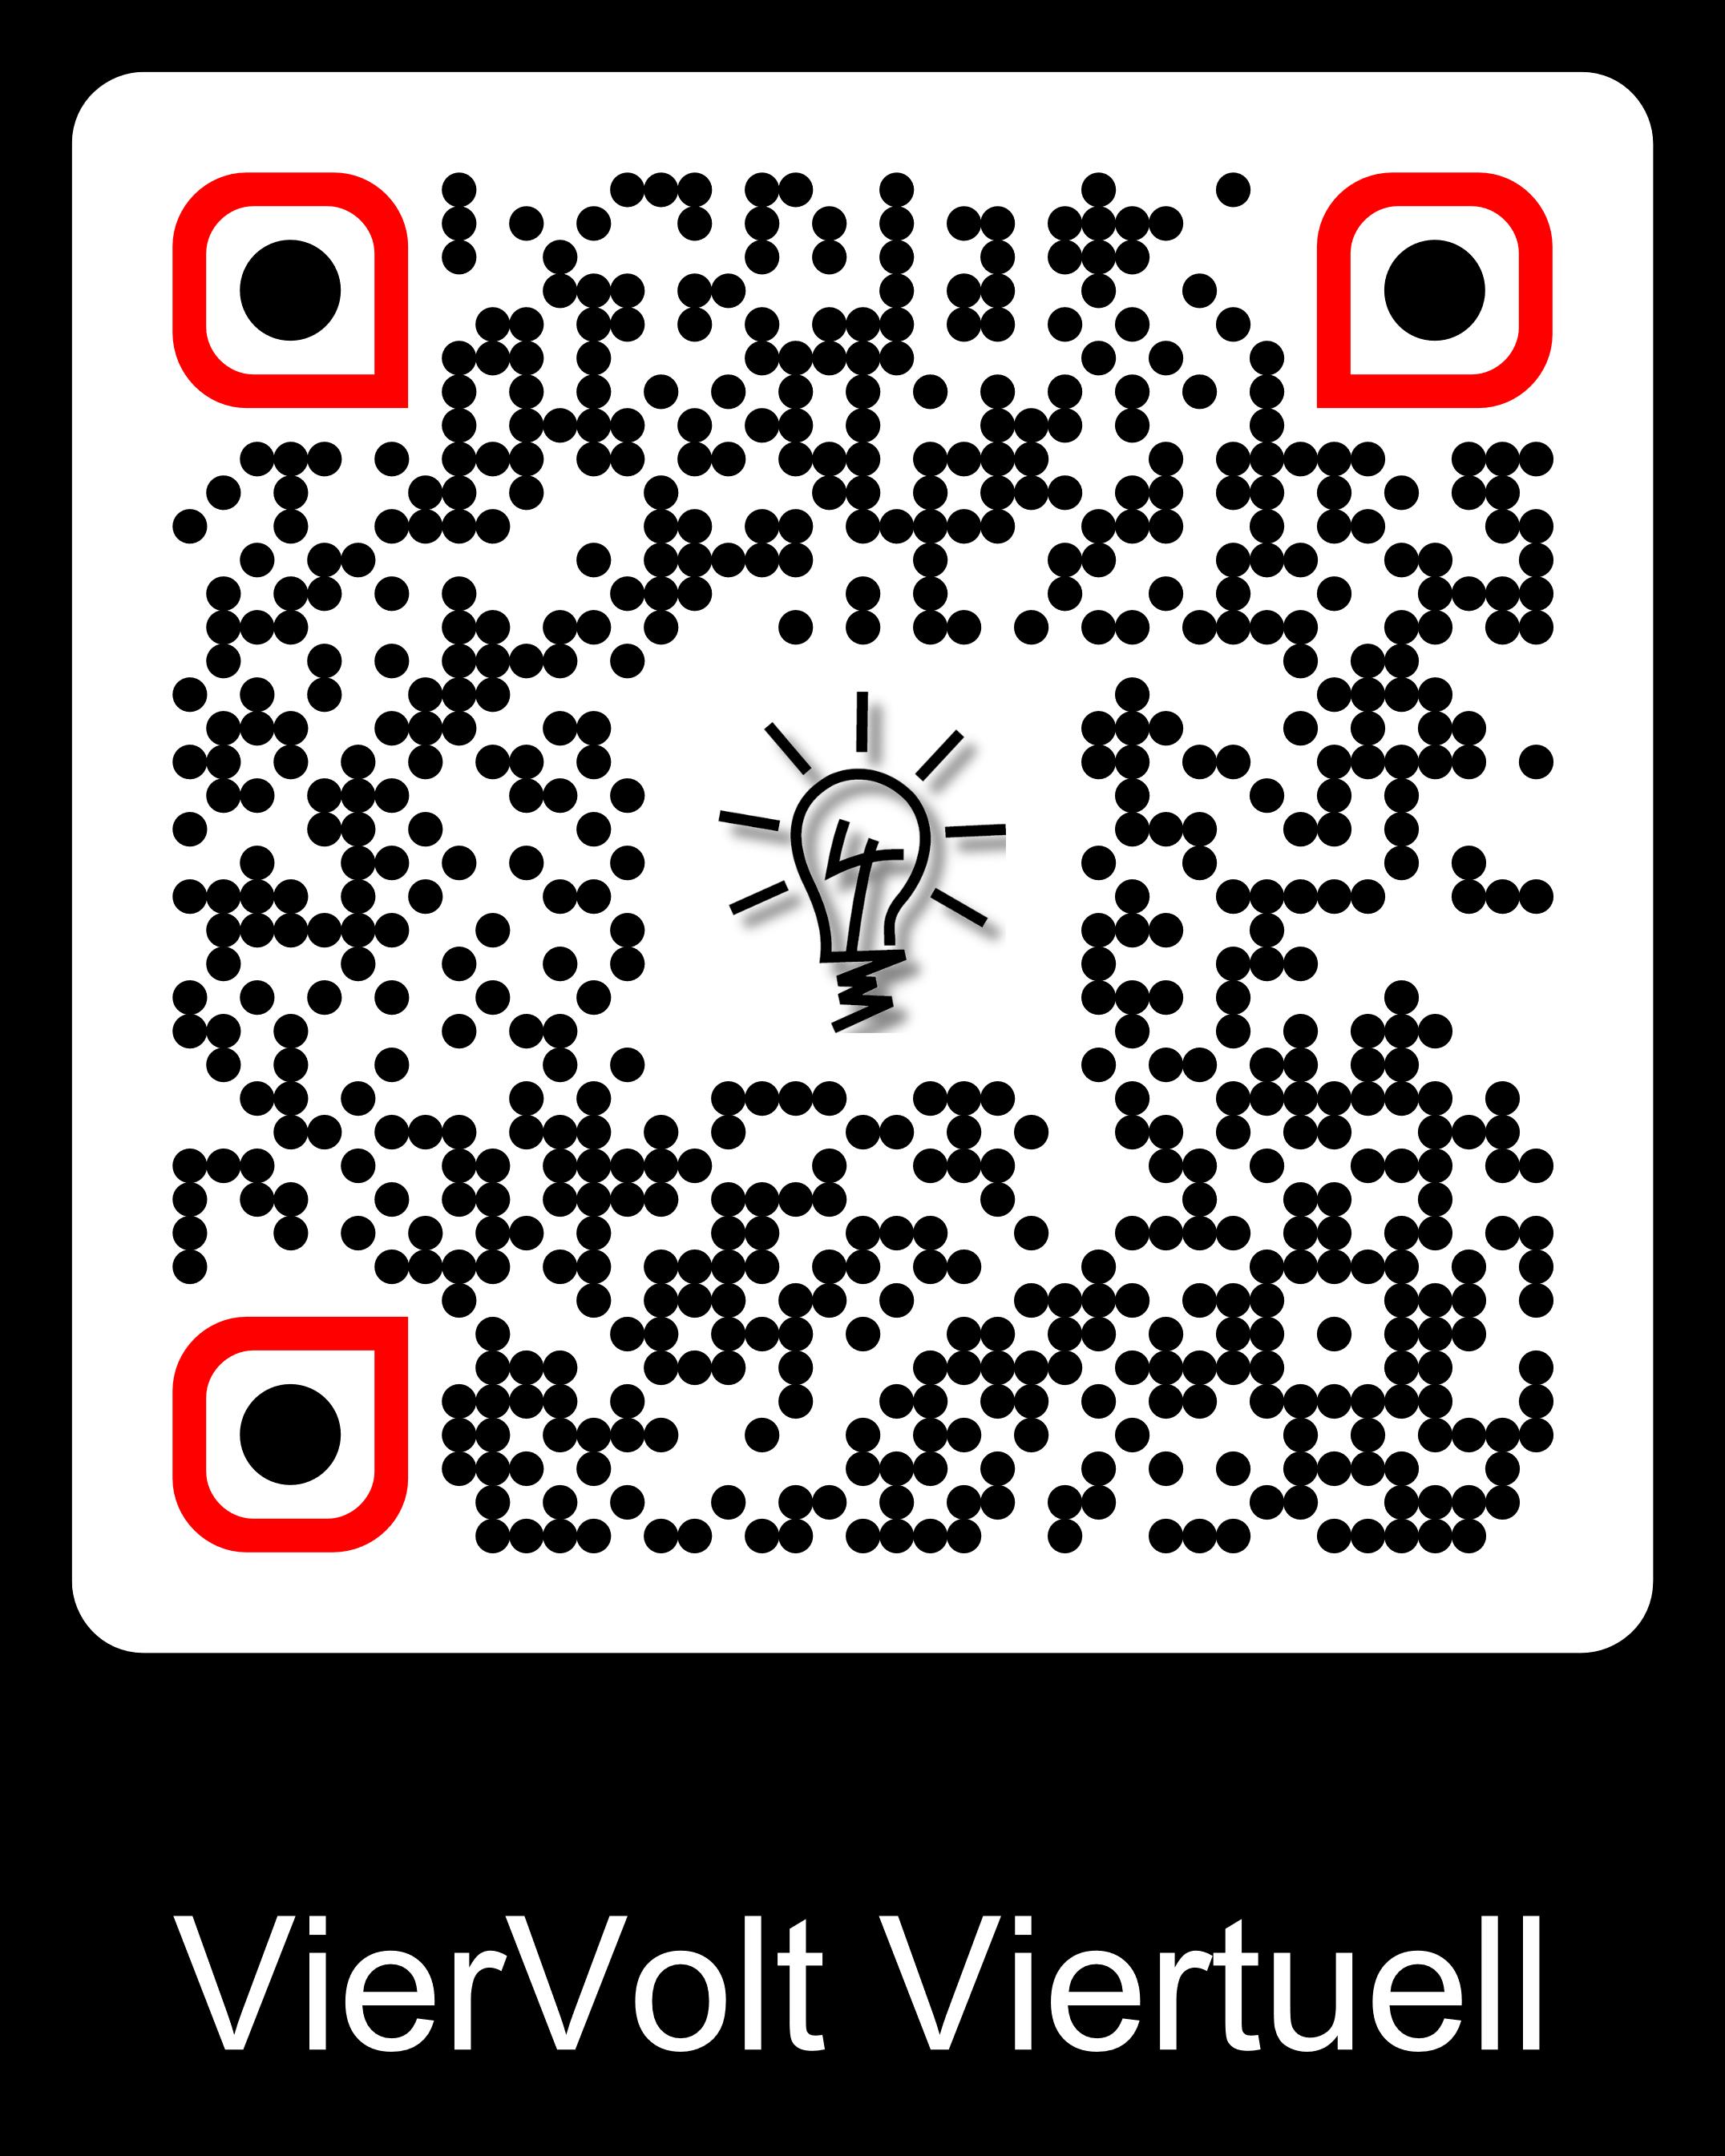 QR-Code zum YouTube Kanal https://www.youtube.com/channel/UC4DqUYZBB6nMD93ESqIkklQ